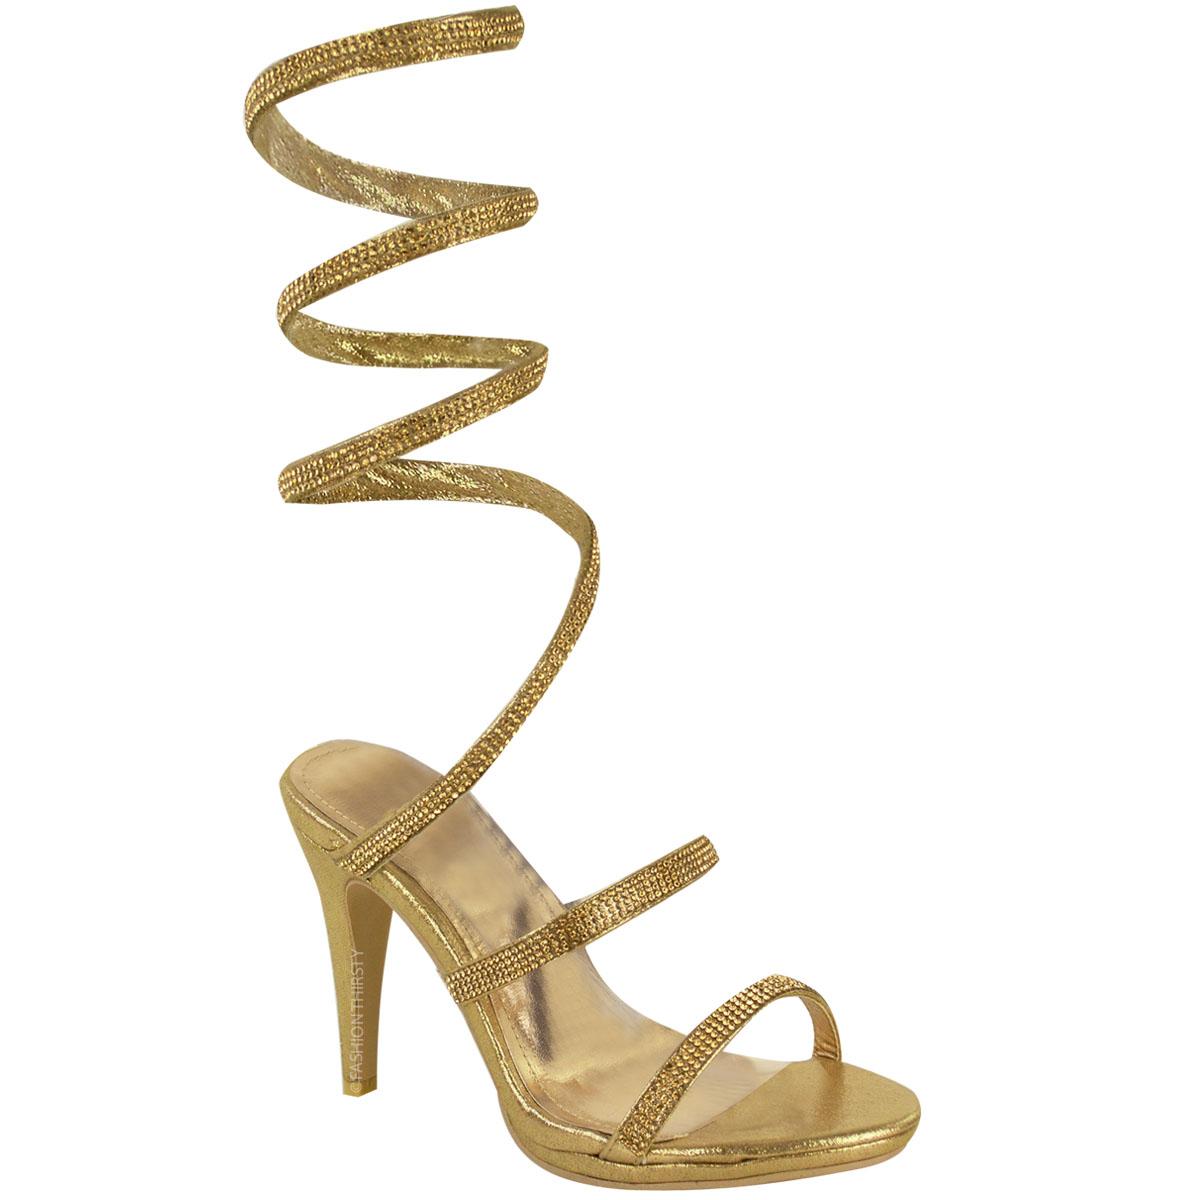 24 Totally Fierce Gladiator Sandals For Summer - Gladiator ...